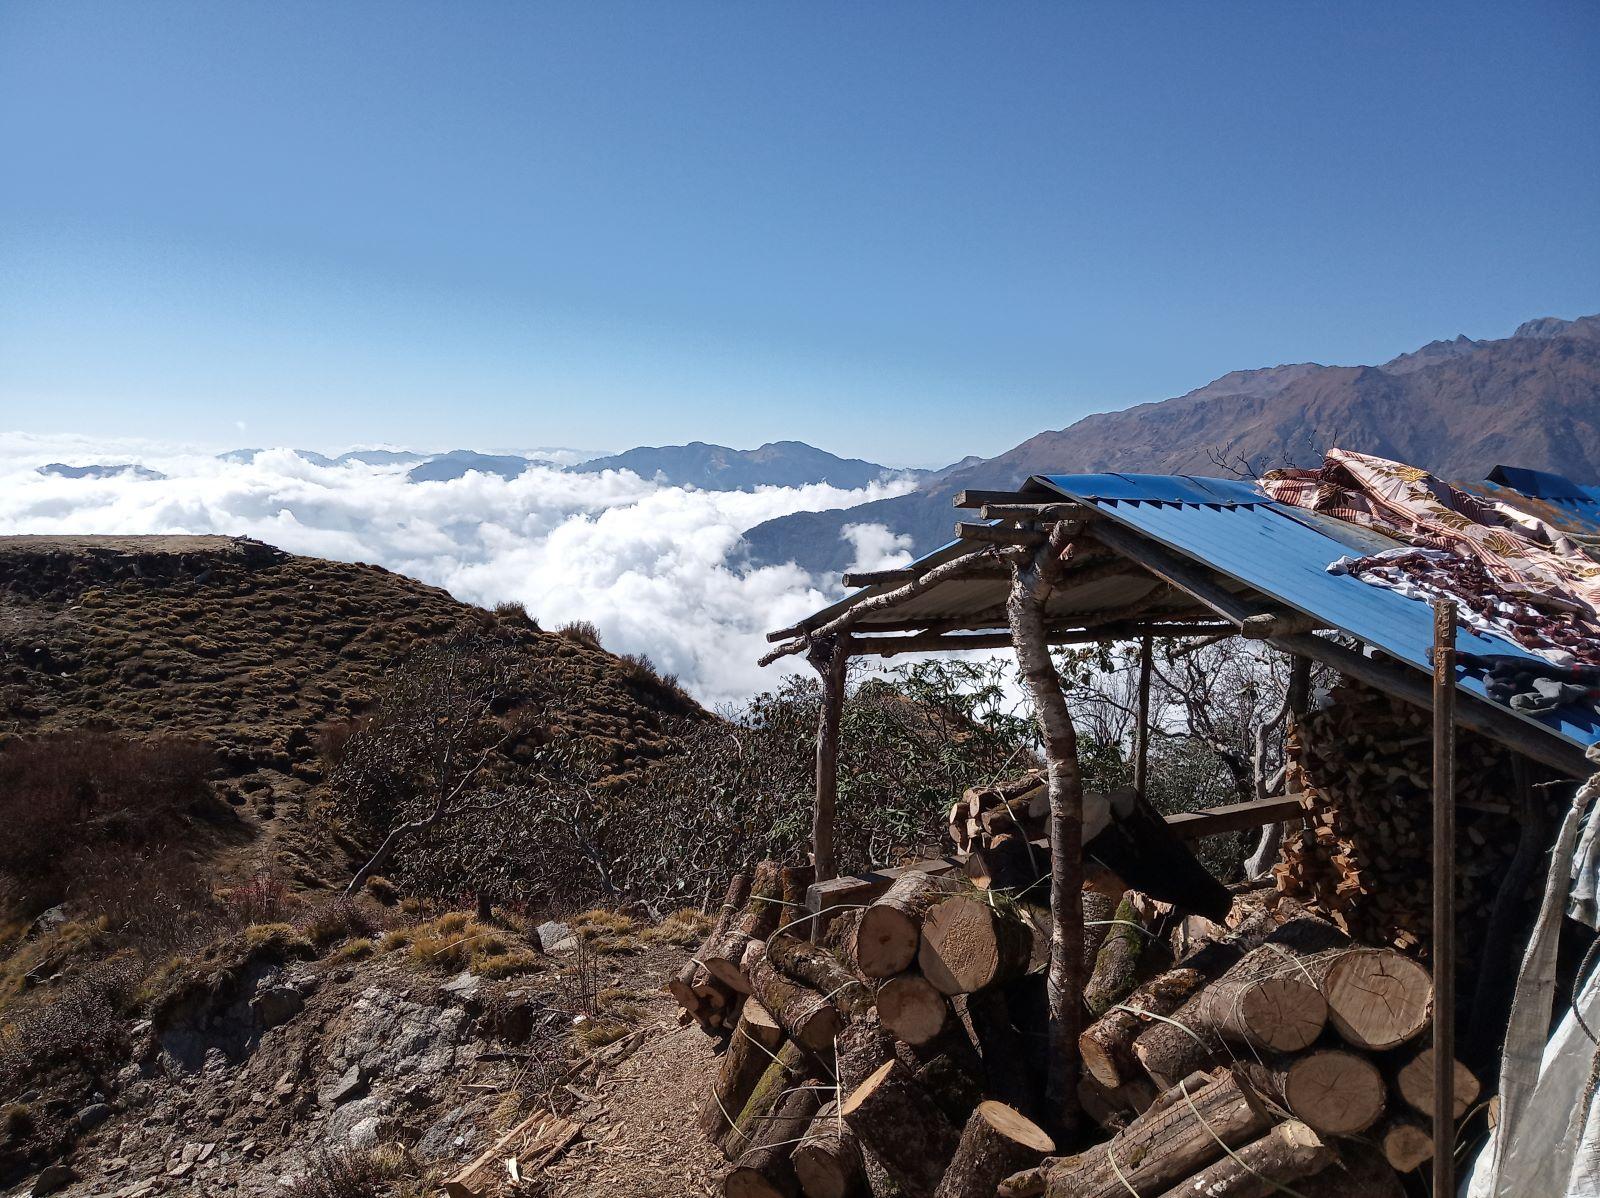 Mardi Himal trek - fot. Tadeusz Szymanowski